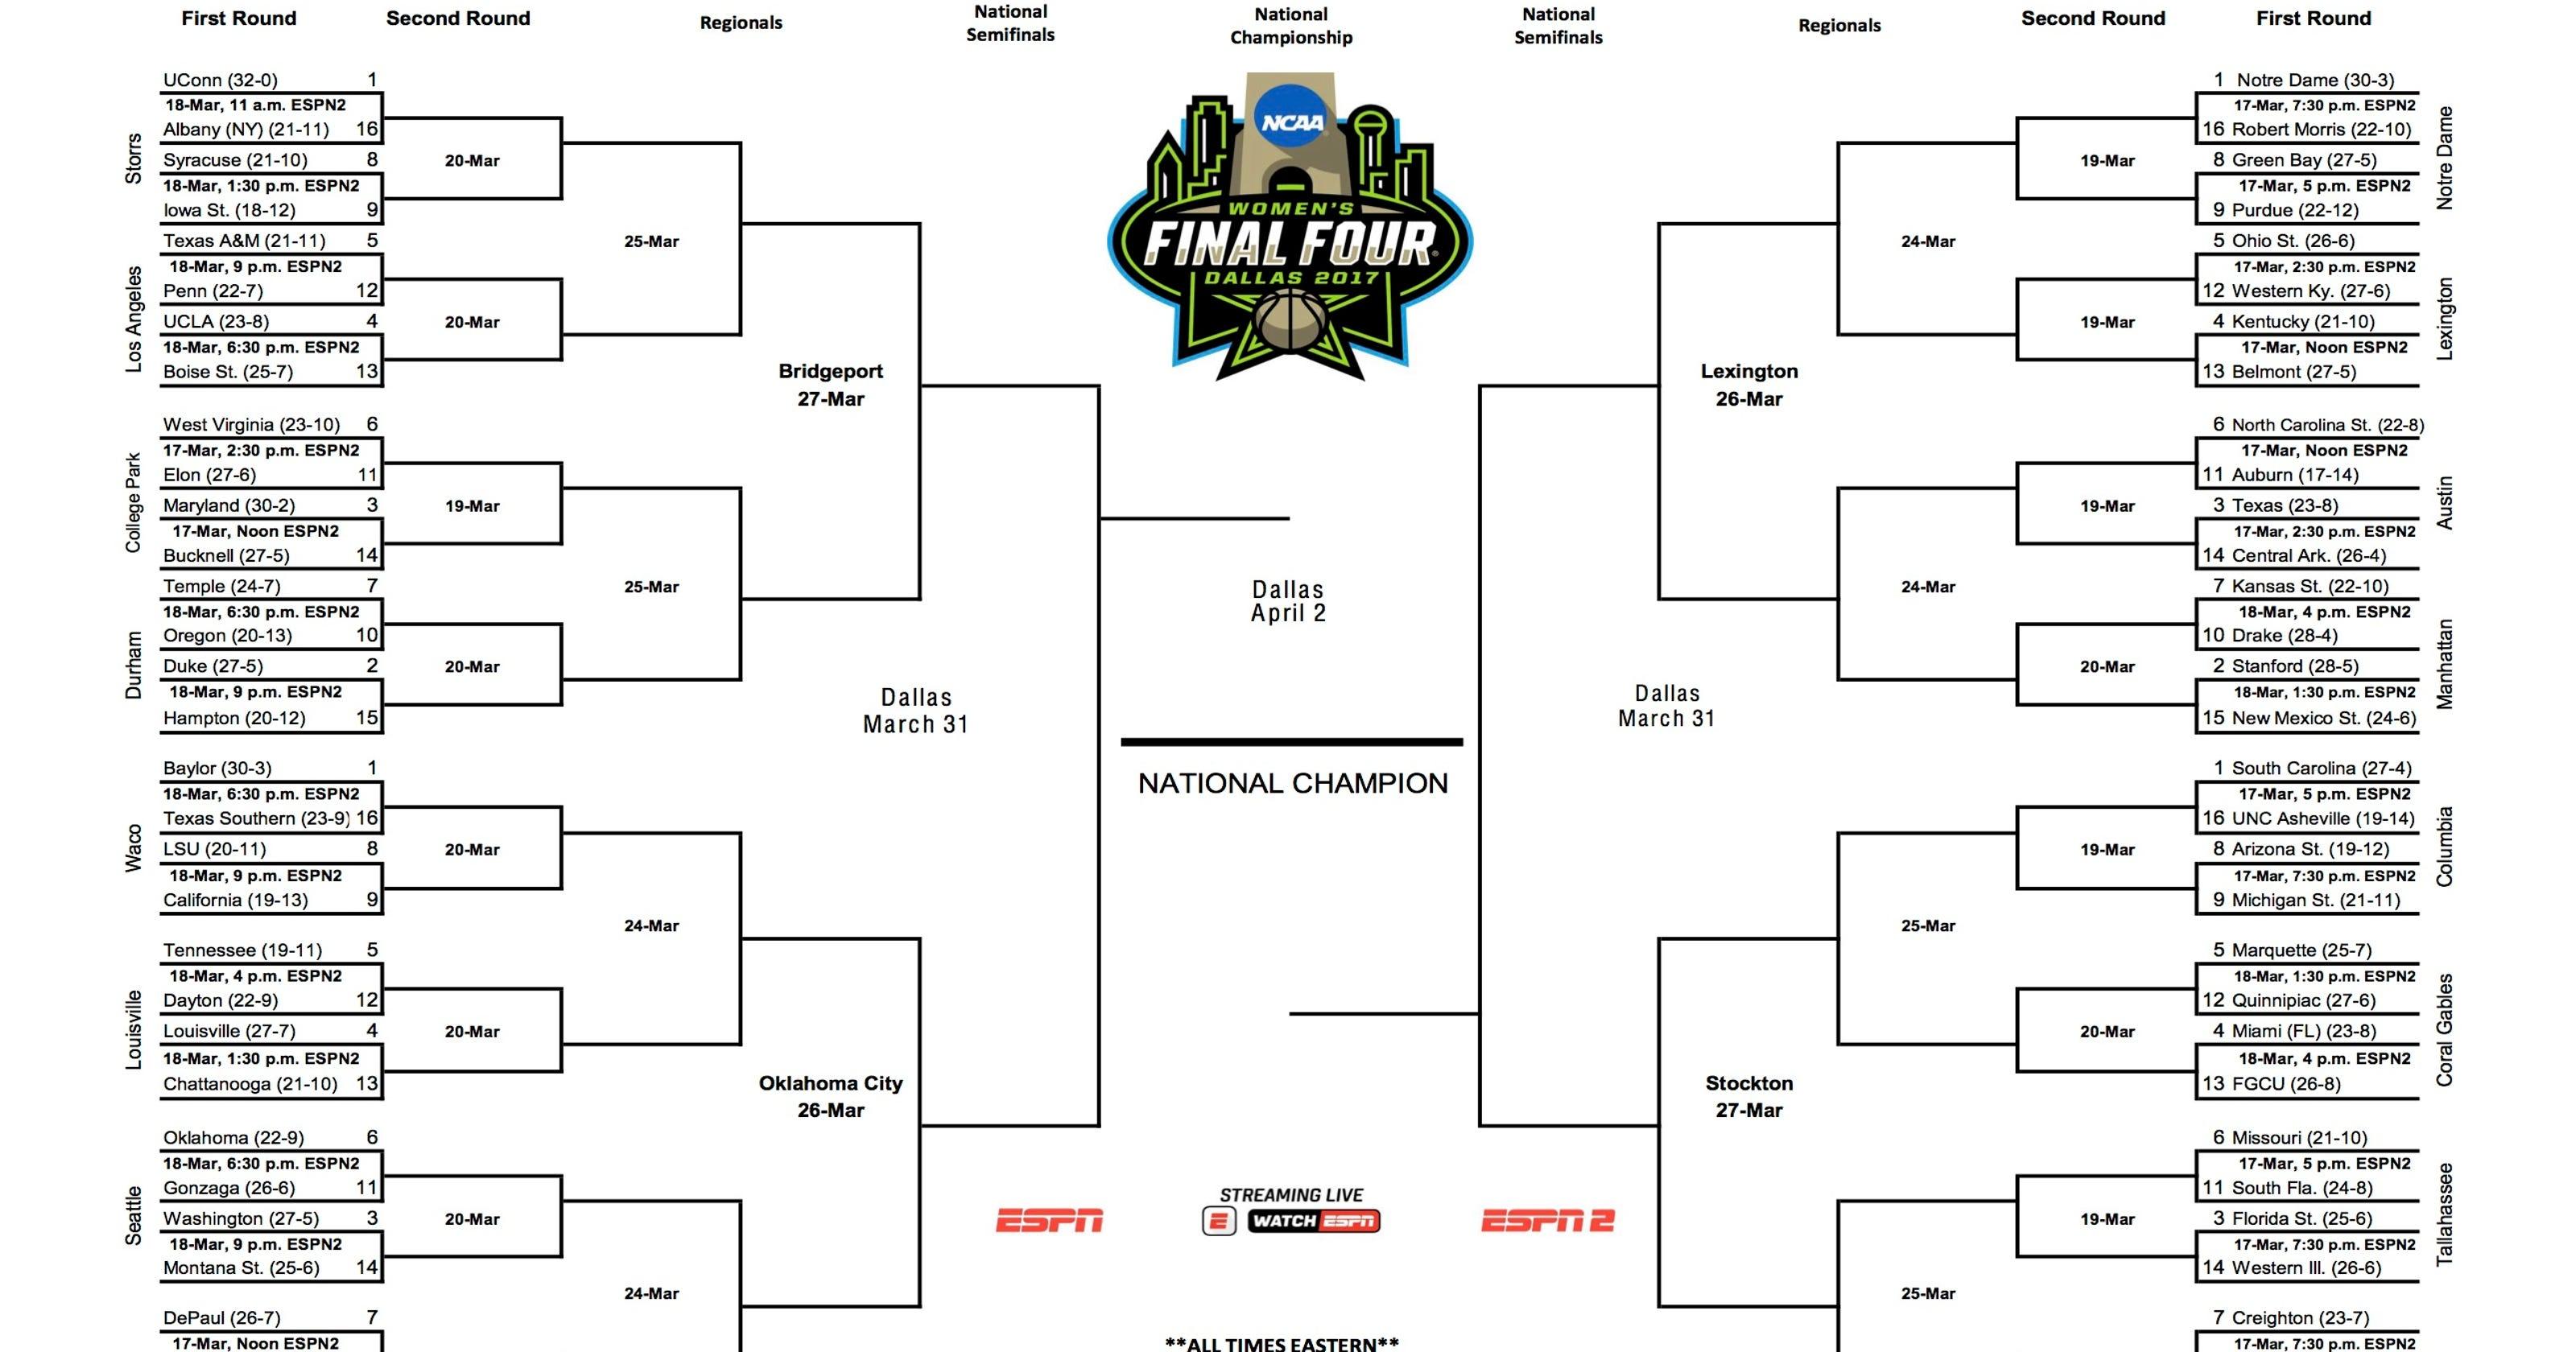 2017 NCAA Women's Tournament Bracket